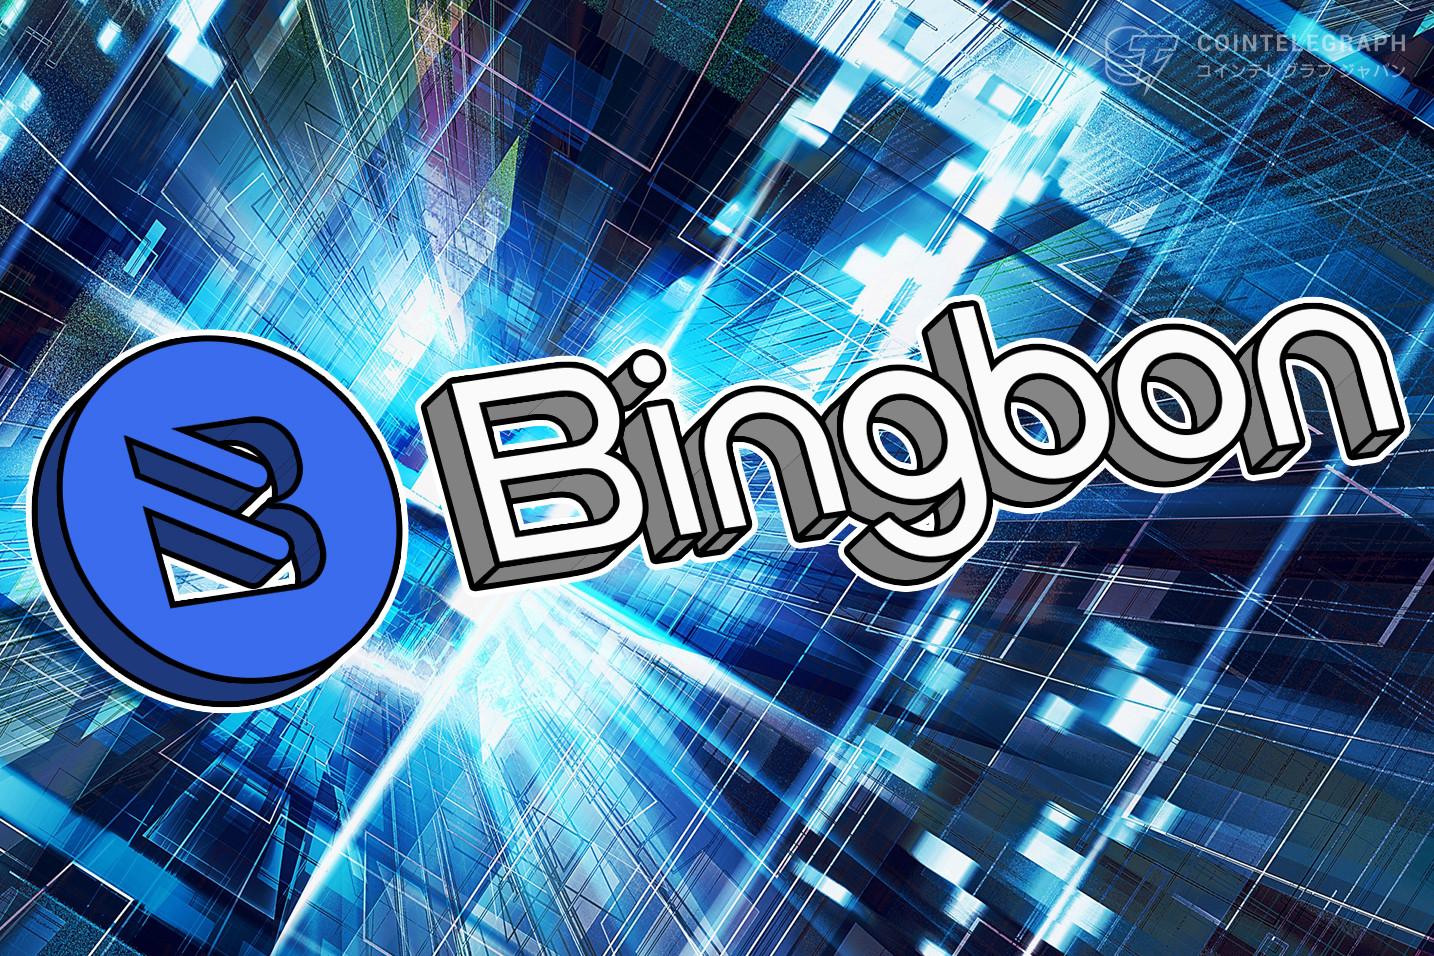 Bingbon取引所 ー 新機能リリース、インバース取引ペア追加、3週間記念祭イベント開催、NFT領域へ